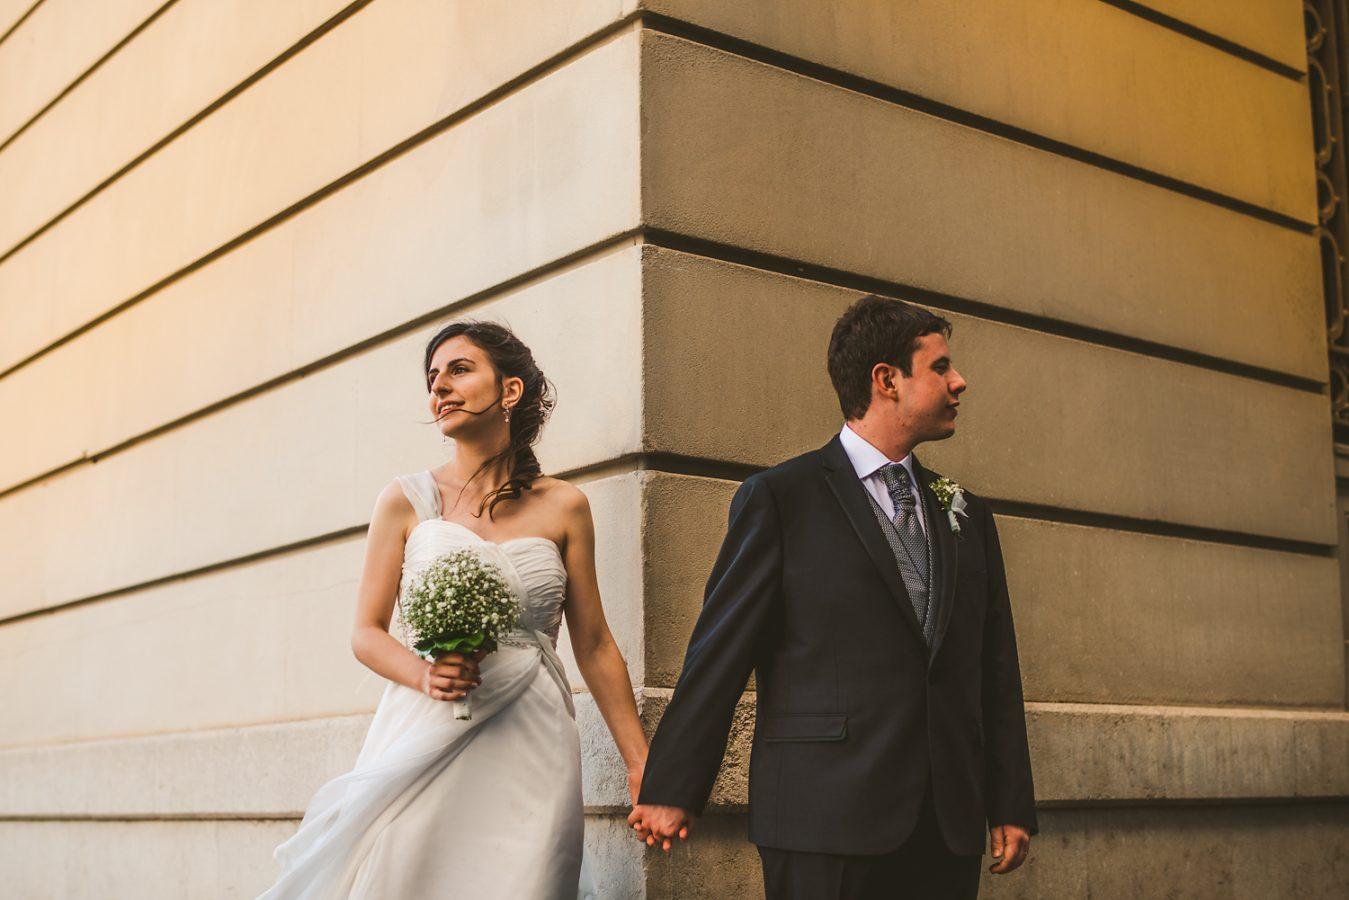 top wedding photographer Leicester